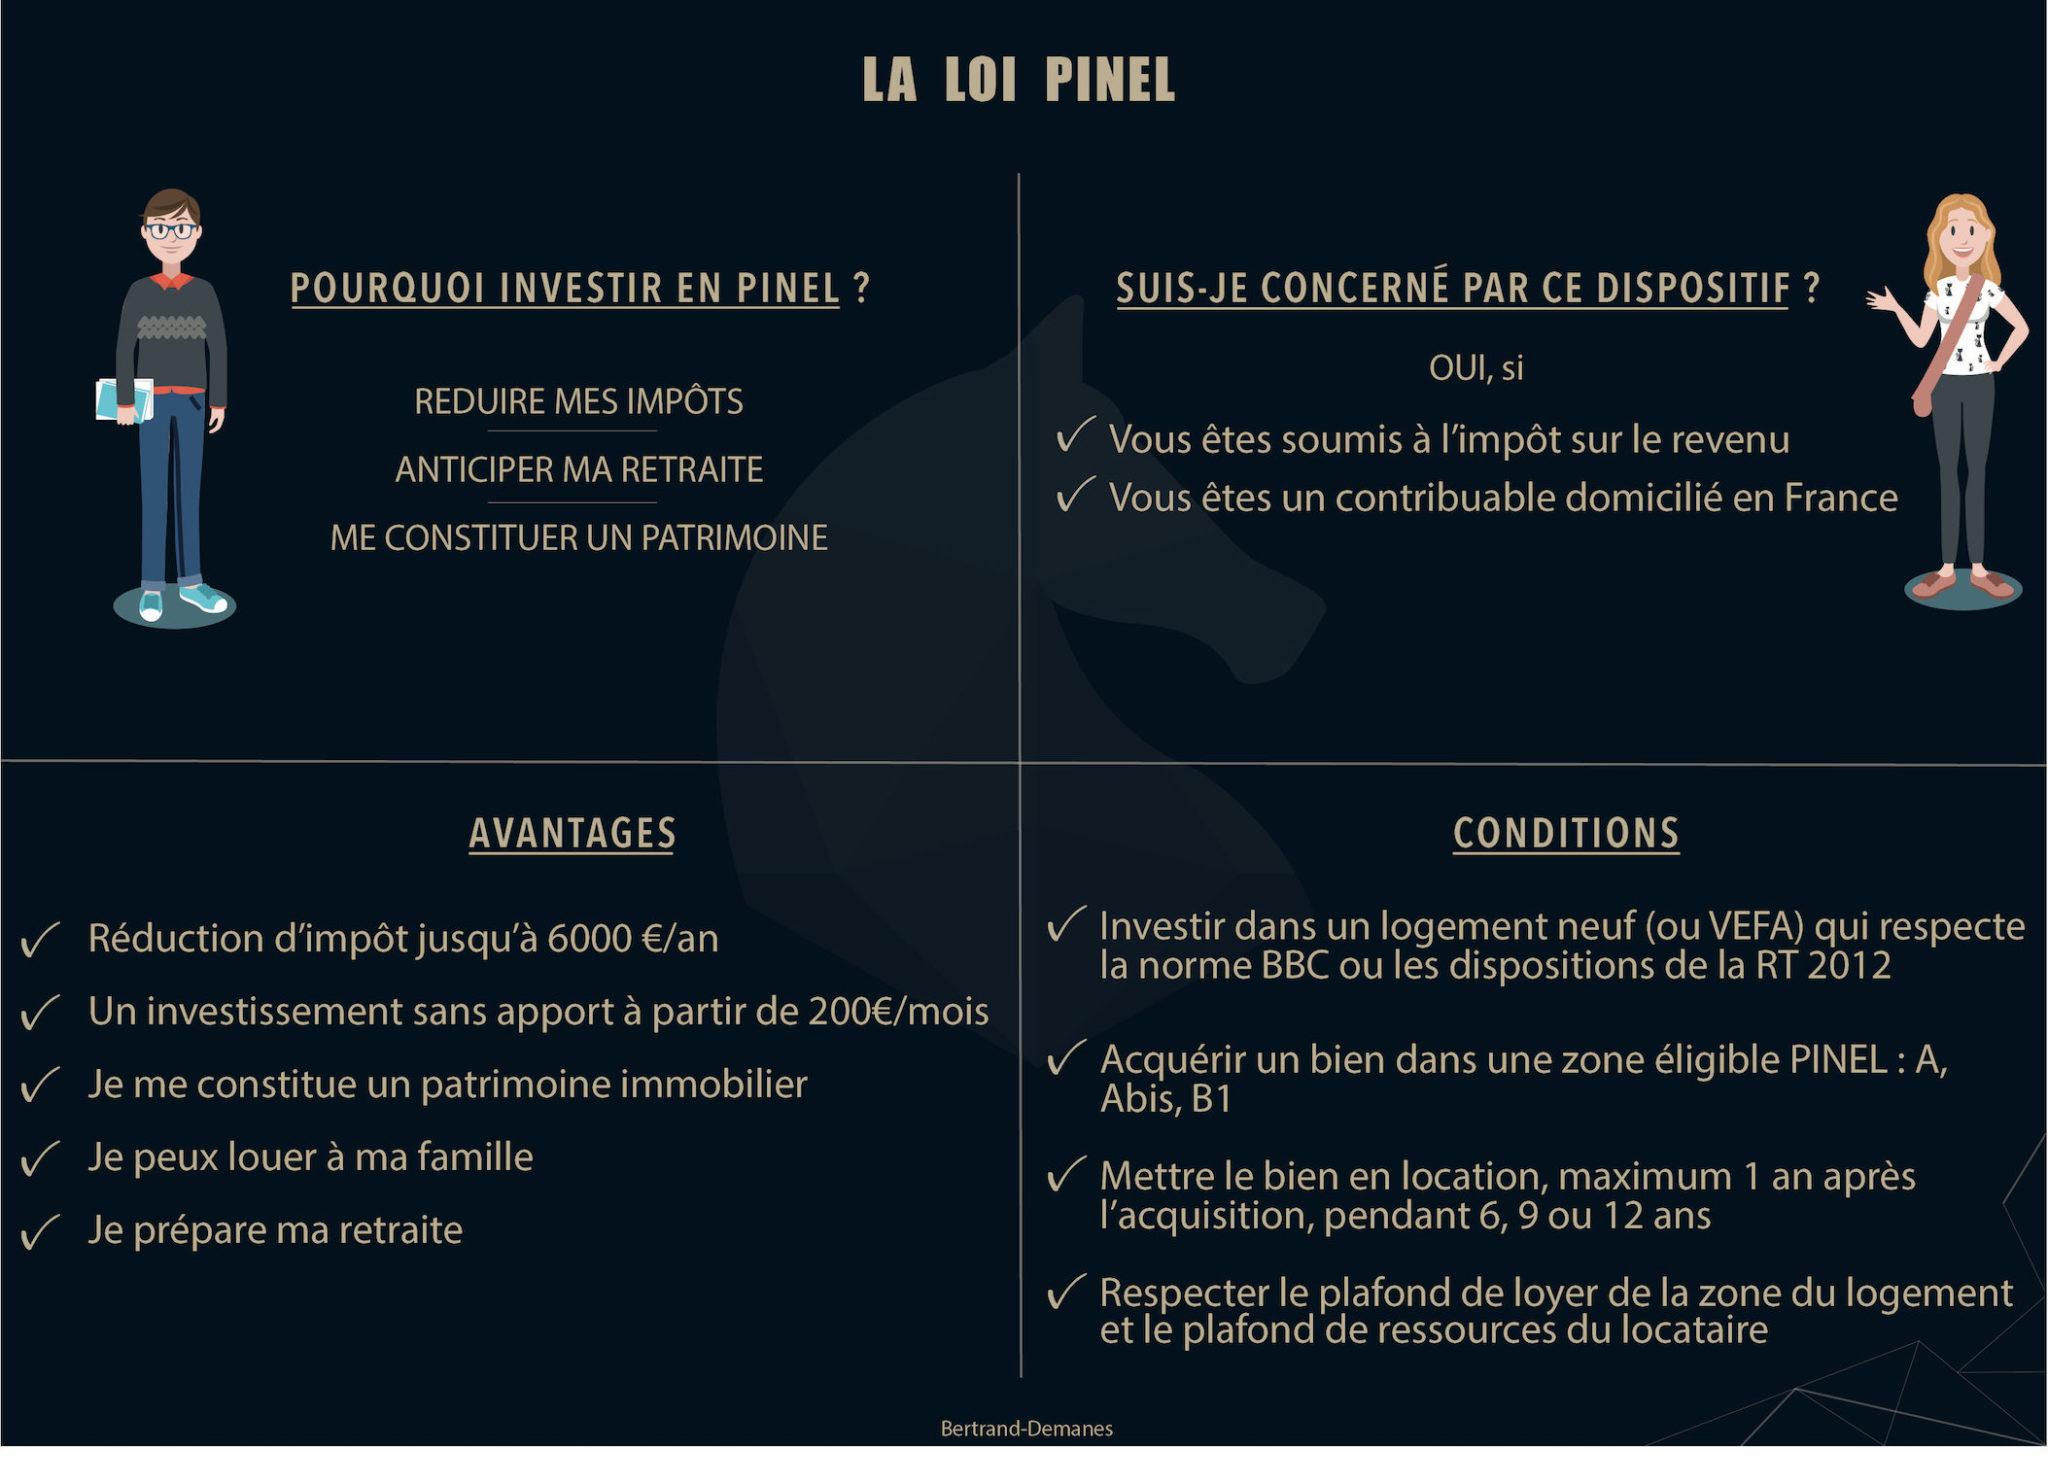 infographie-loi-pinel-marseille-bertrand-demanes